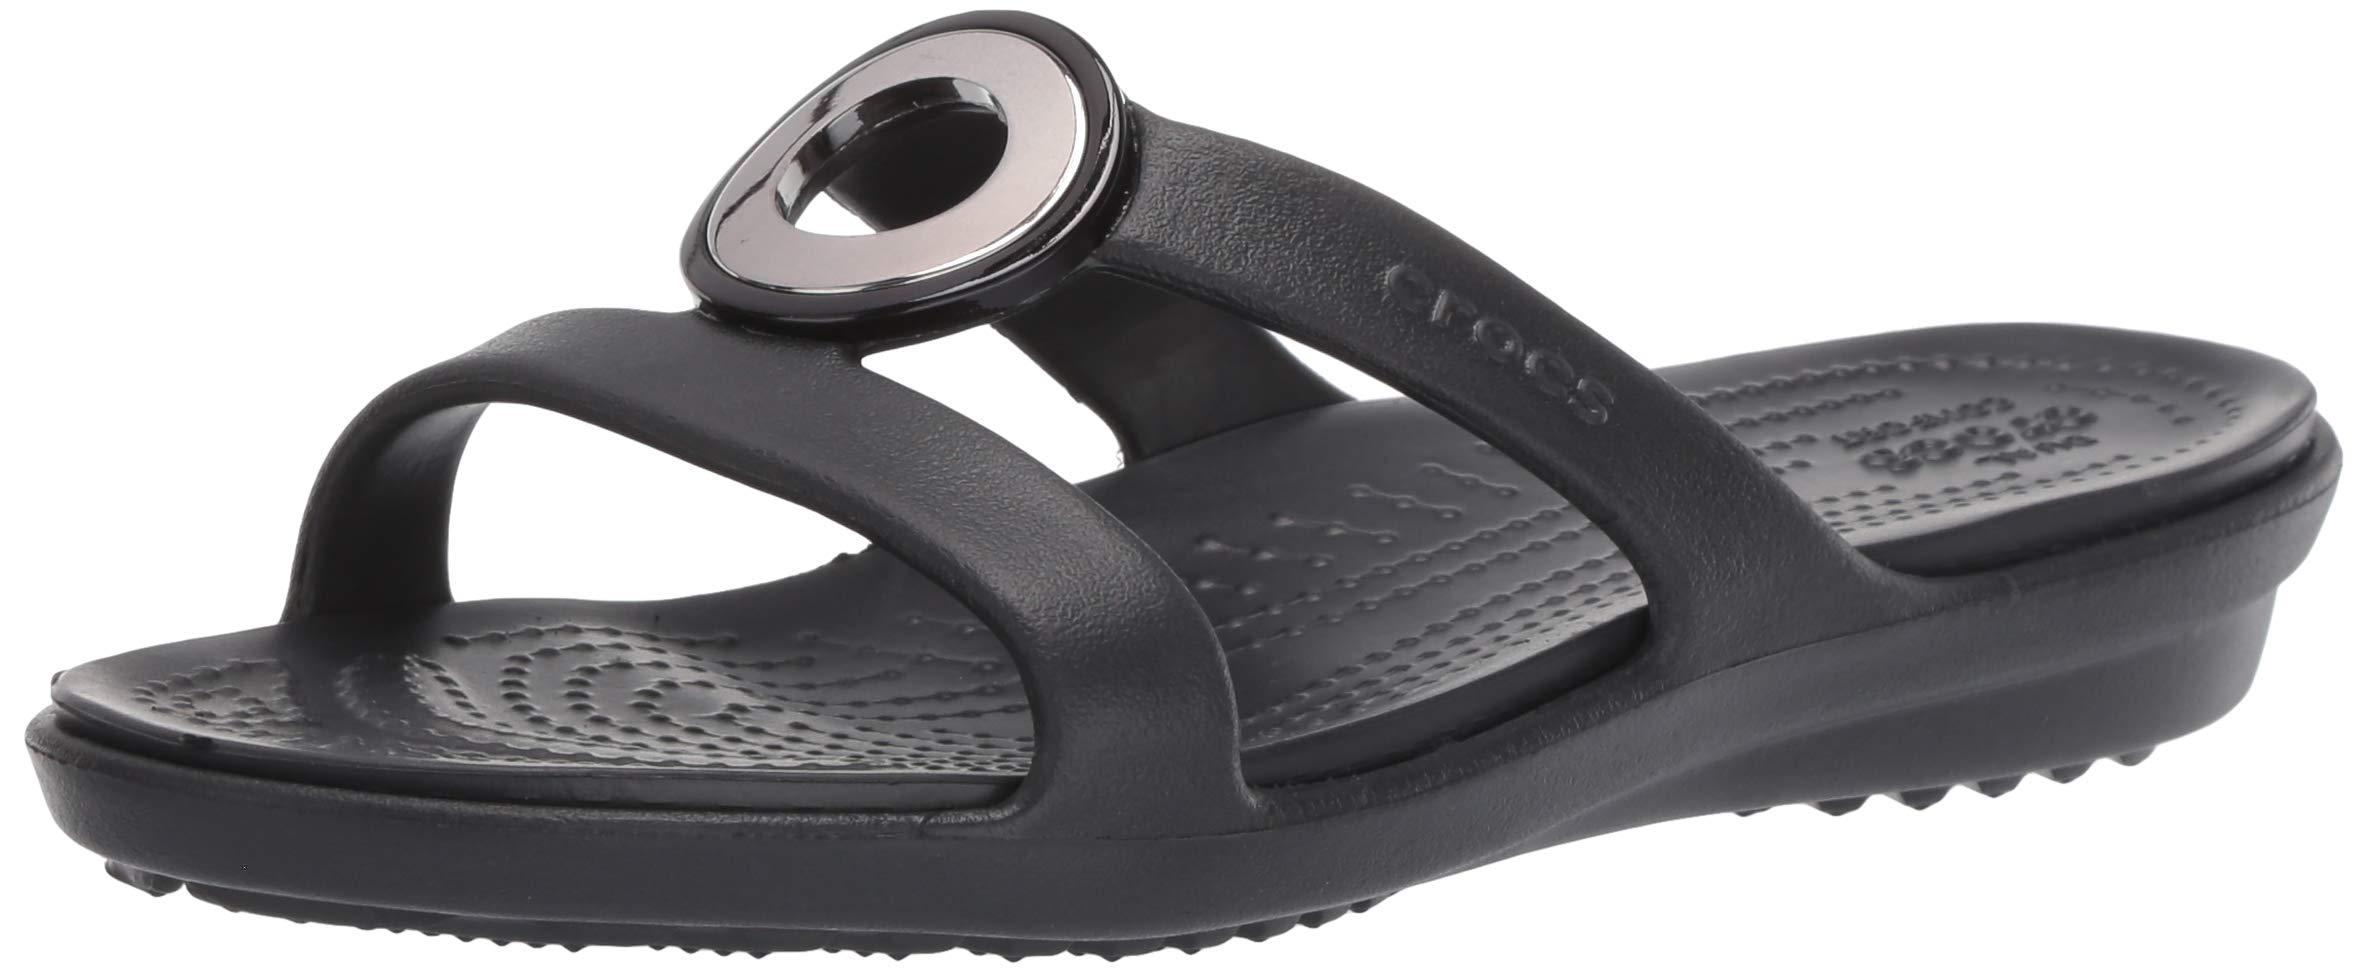 Crocs Women's Sanrah MetalBlock Sandal Slide, Gunmetal/Black, 10 M US by Crocs